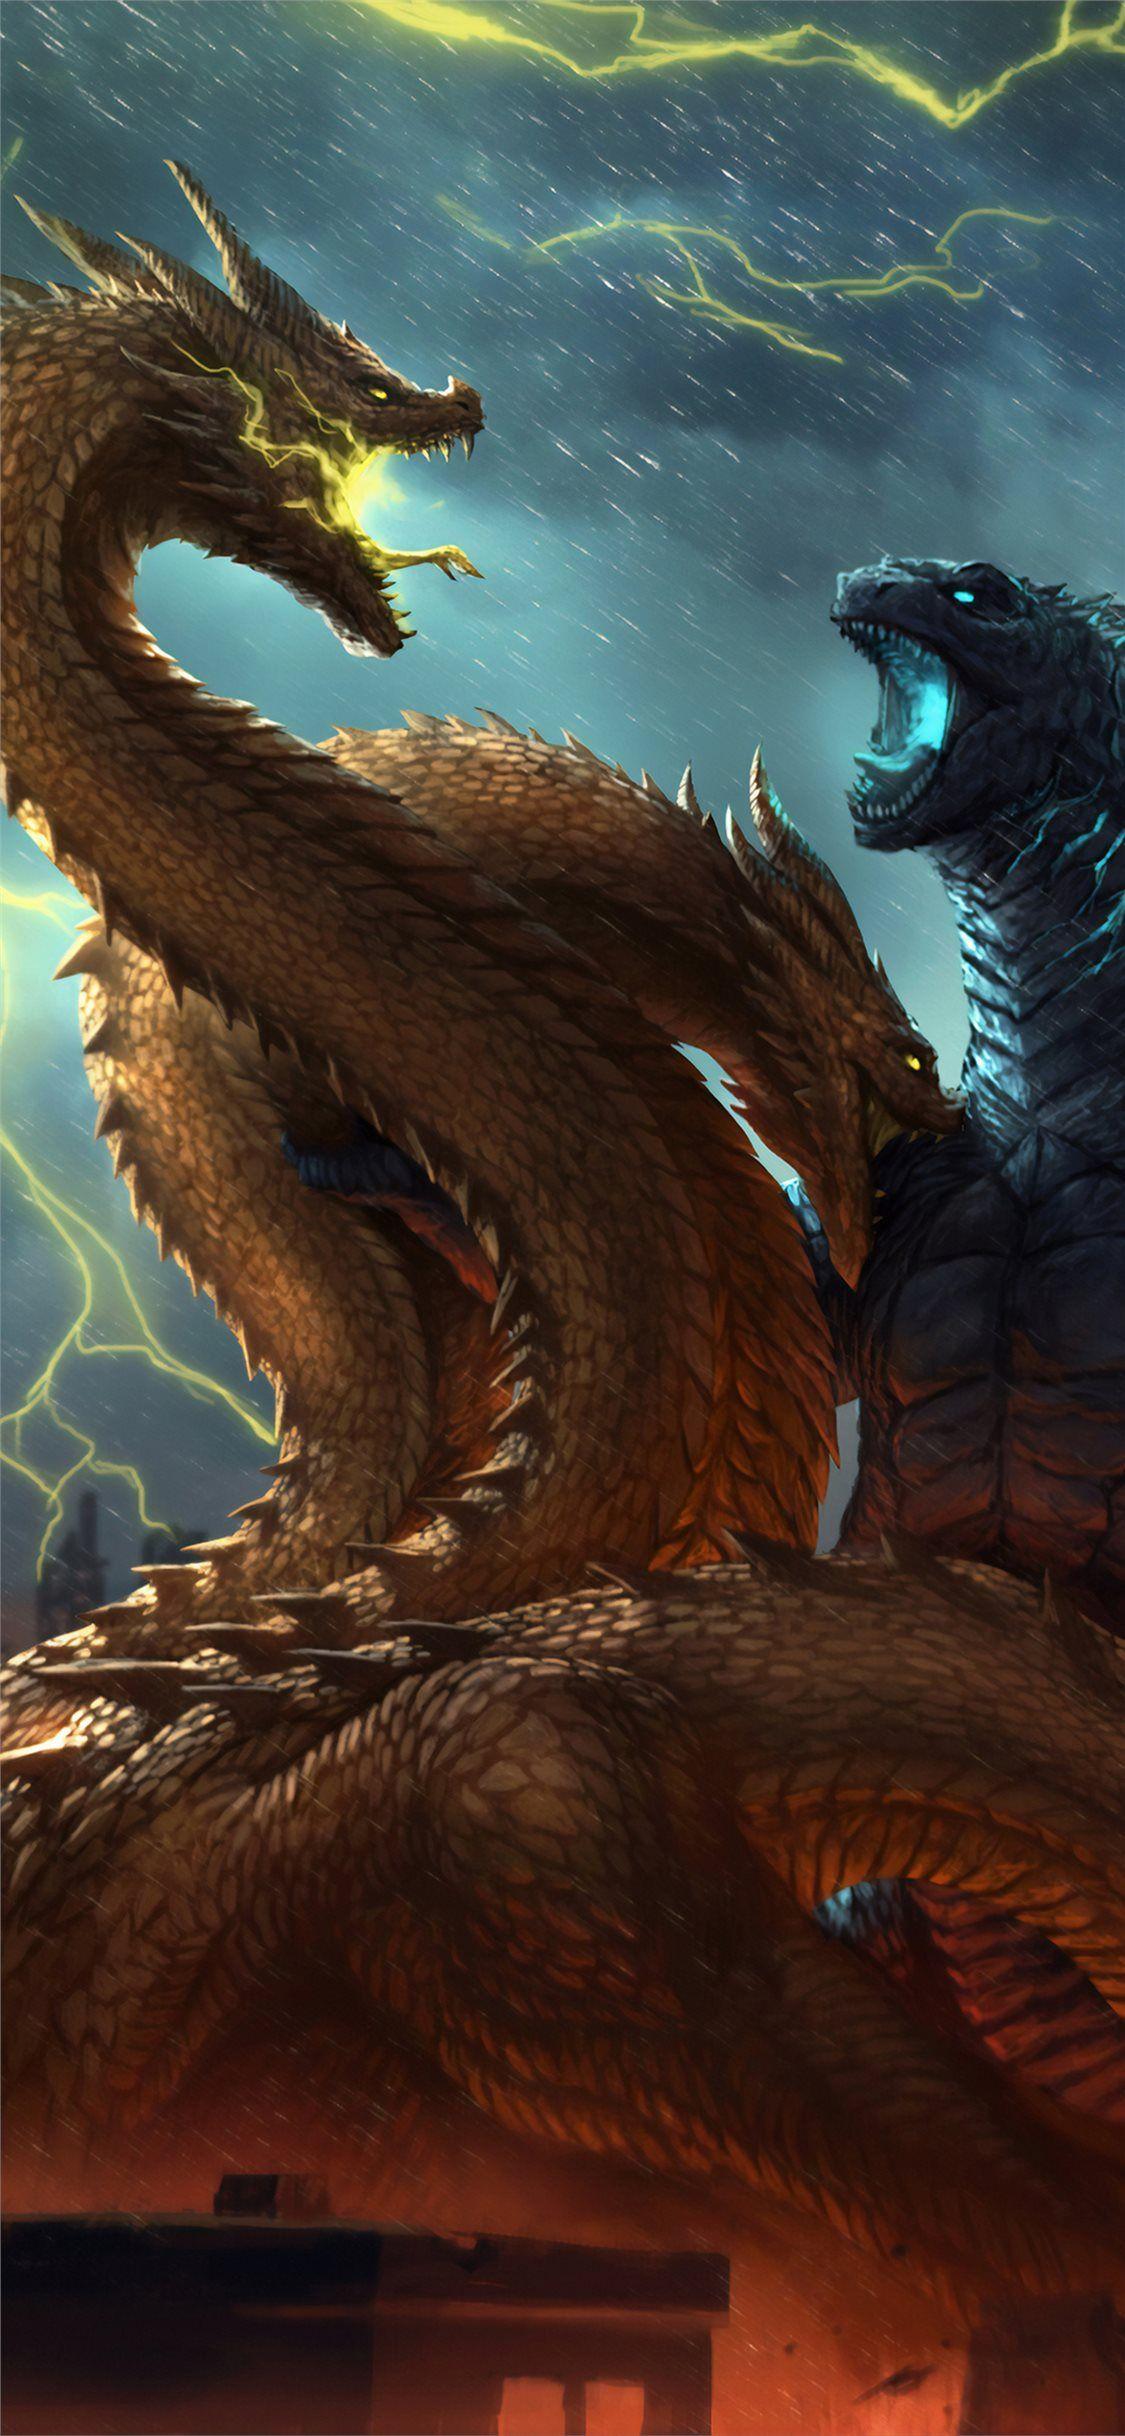 Godzilla King Of The Monsters Fanposter 4k Wallpaper In 2020 Godzilla Wallpaper Godzilla Beautiful Backgrounds